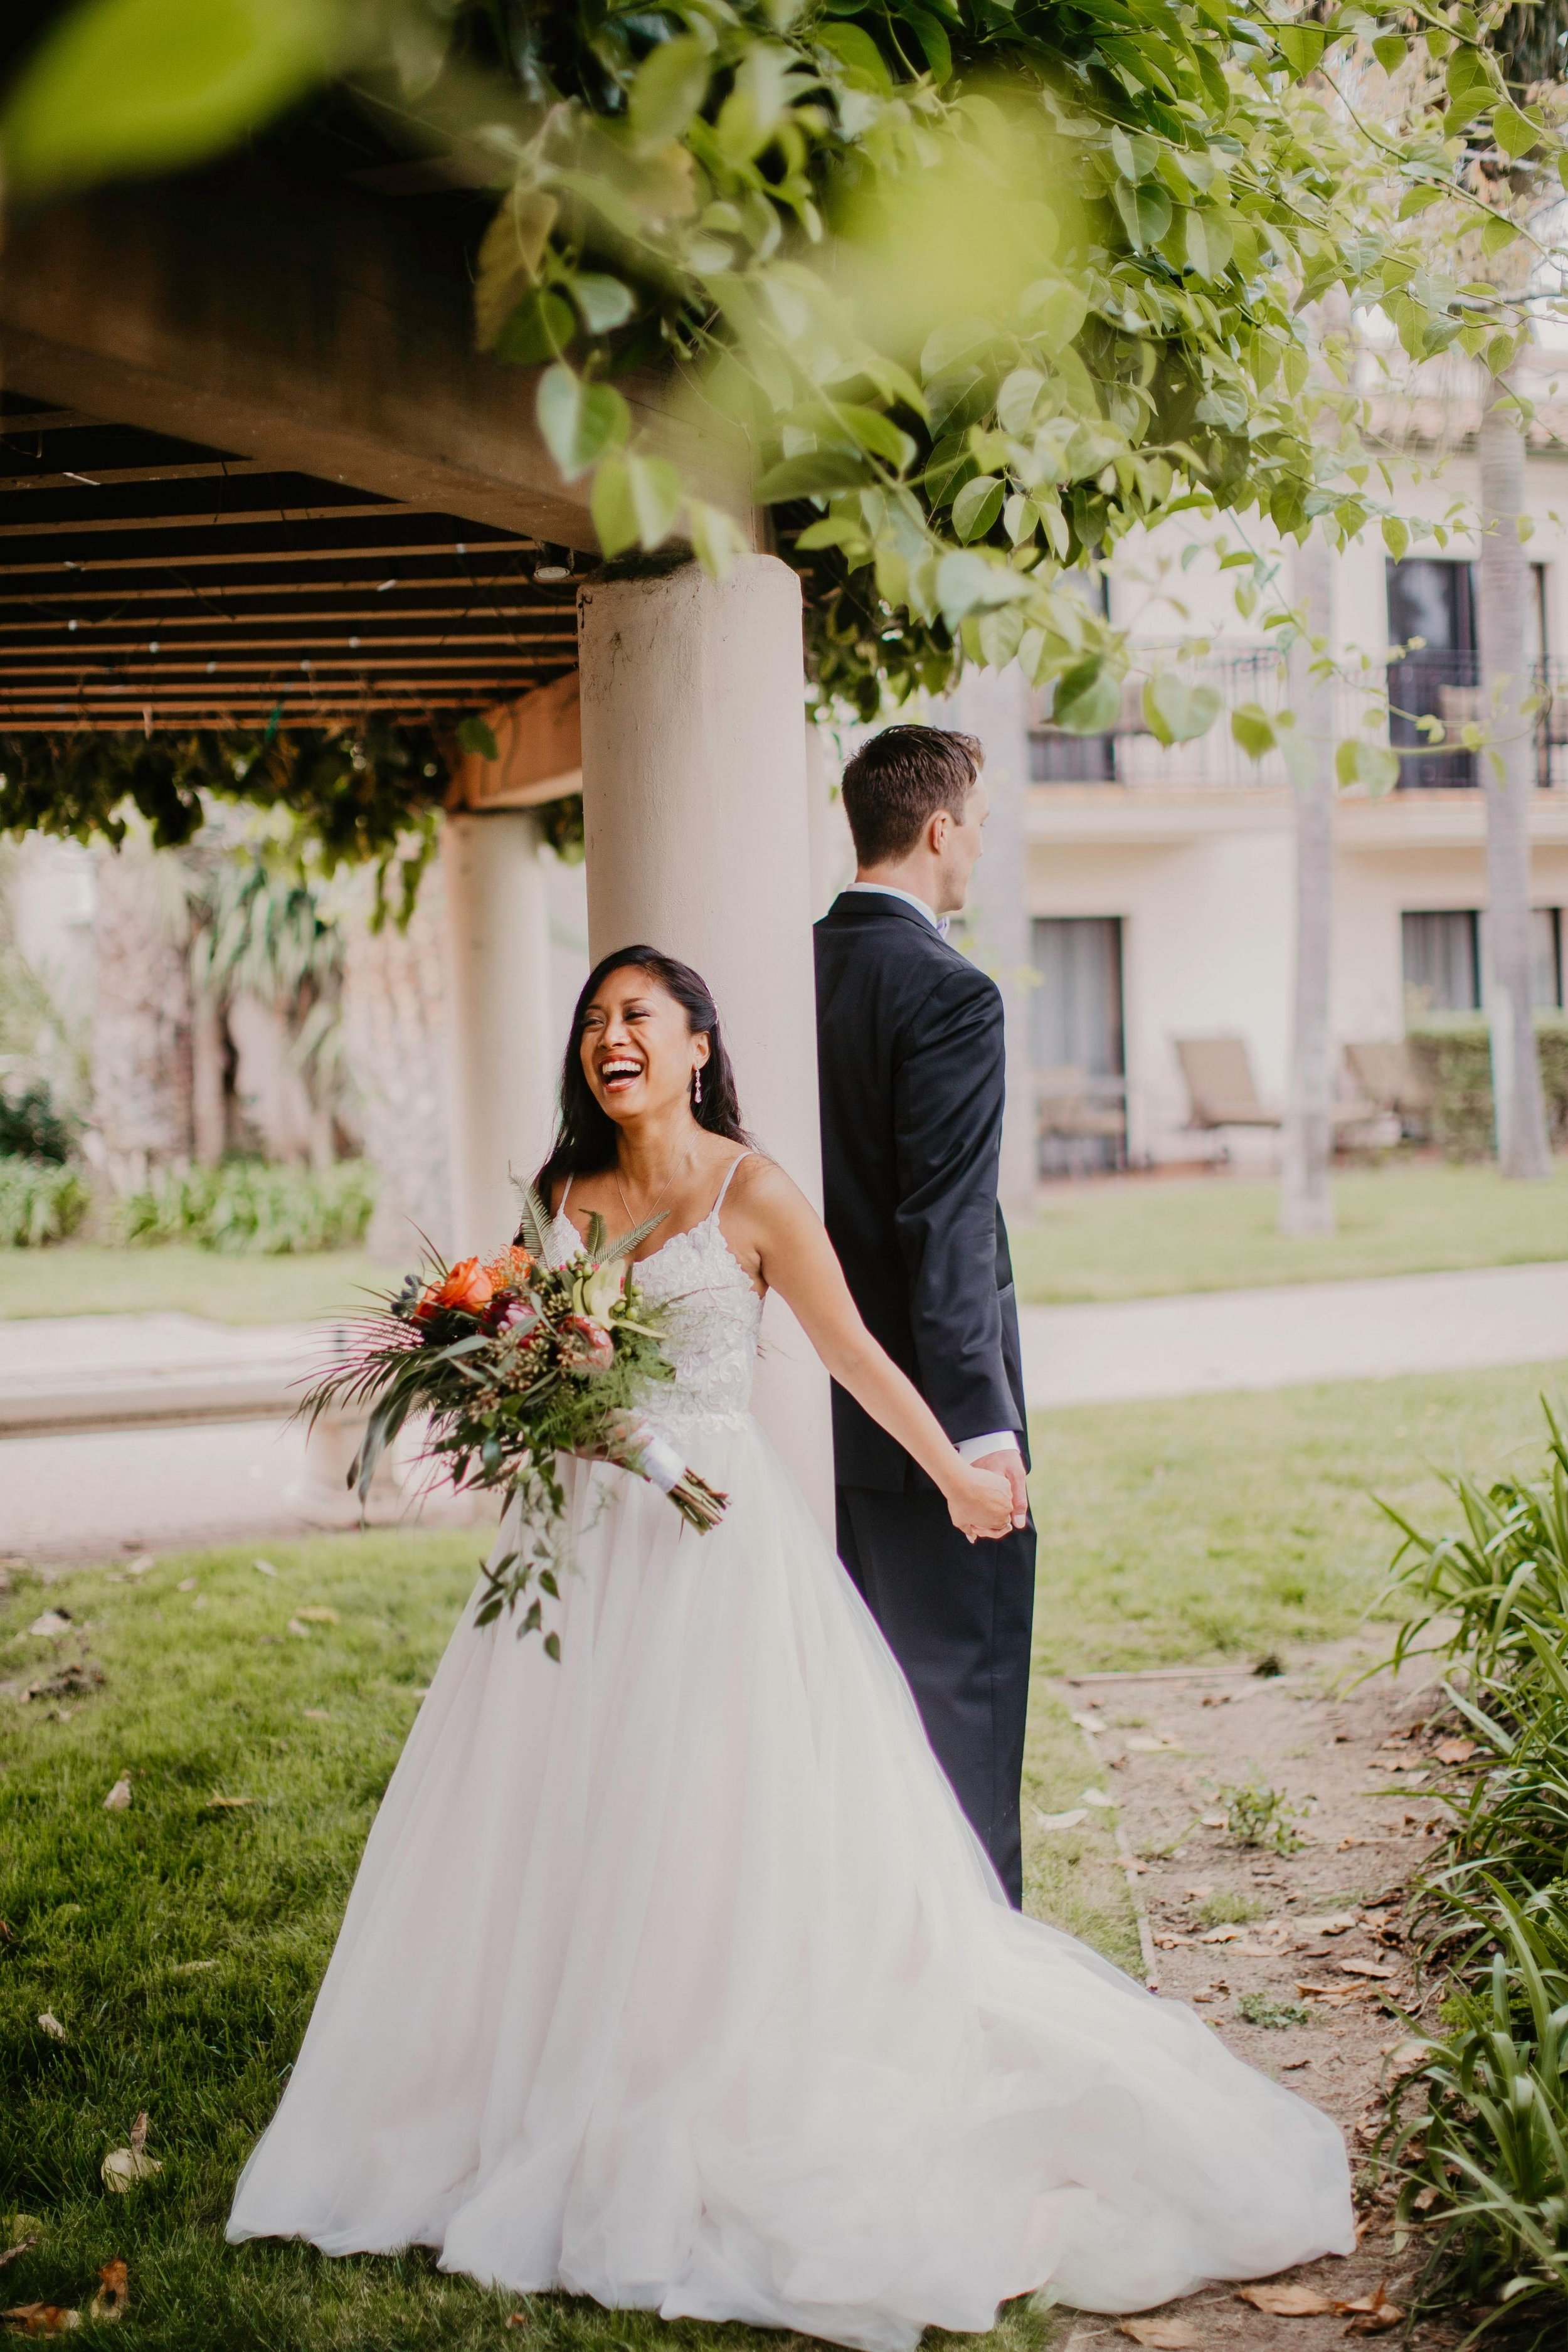 www.santabarbarawedding.com | Candice Marie Photography | Hilton Santa Barbara Beachfront Resort | Dalina Klan | Once in a Lifetime Weddings | Alpha Floral | Couple Before First Look